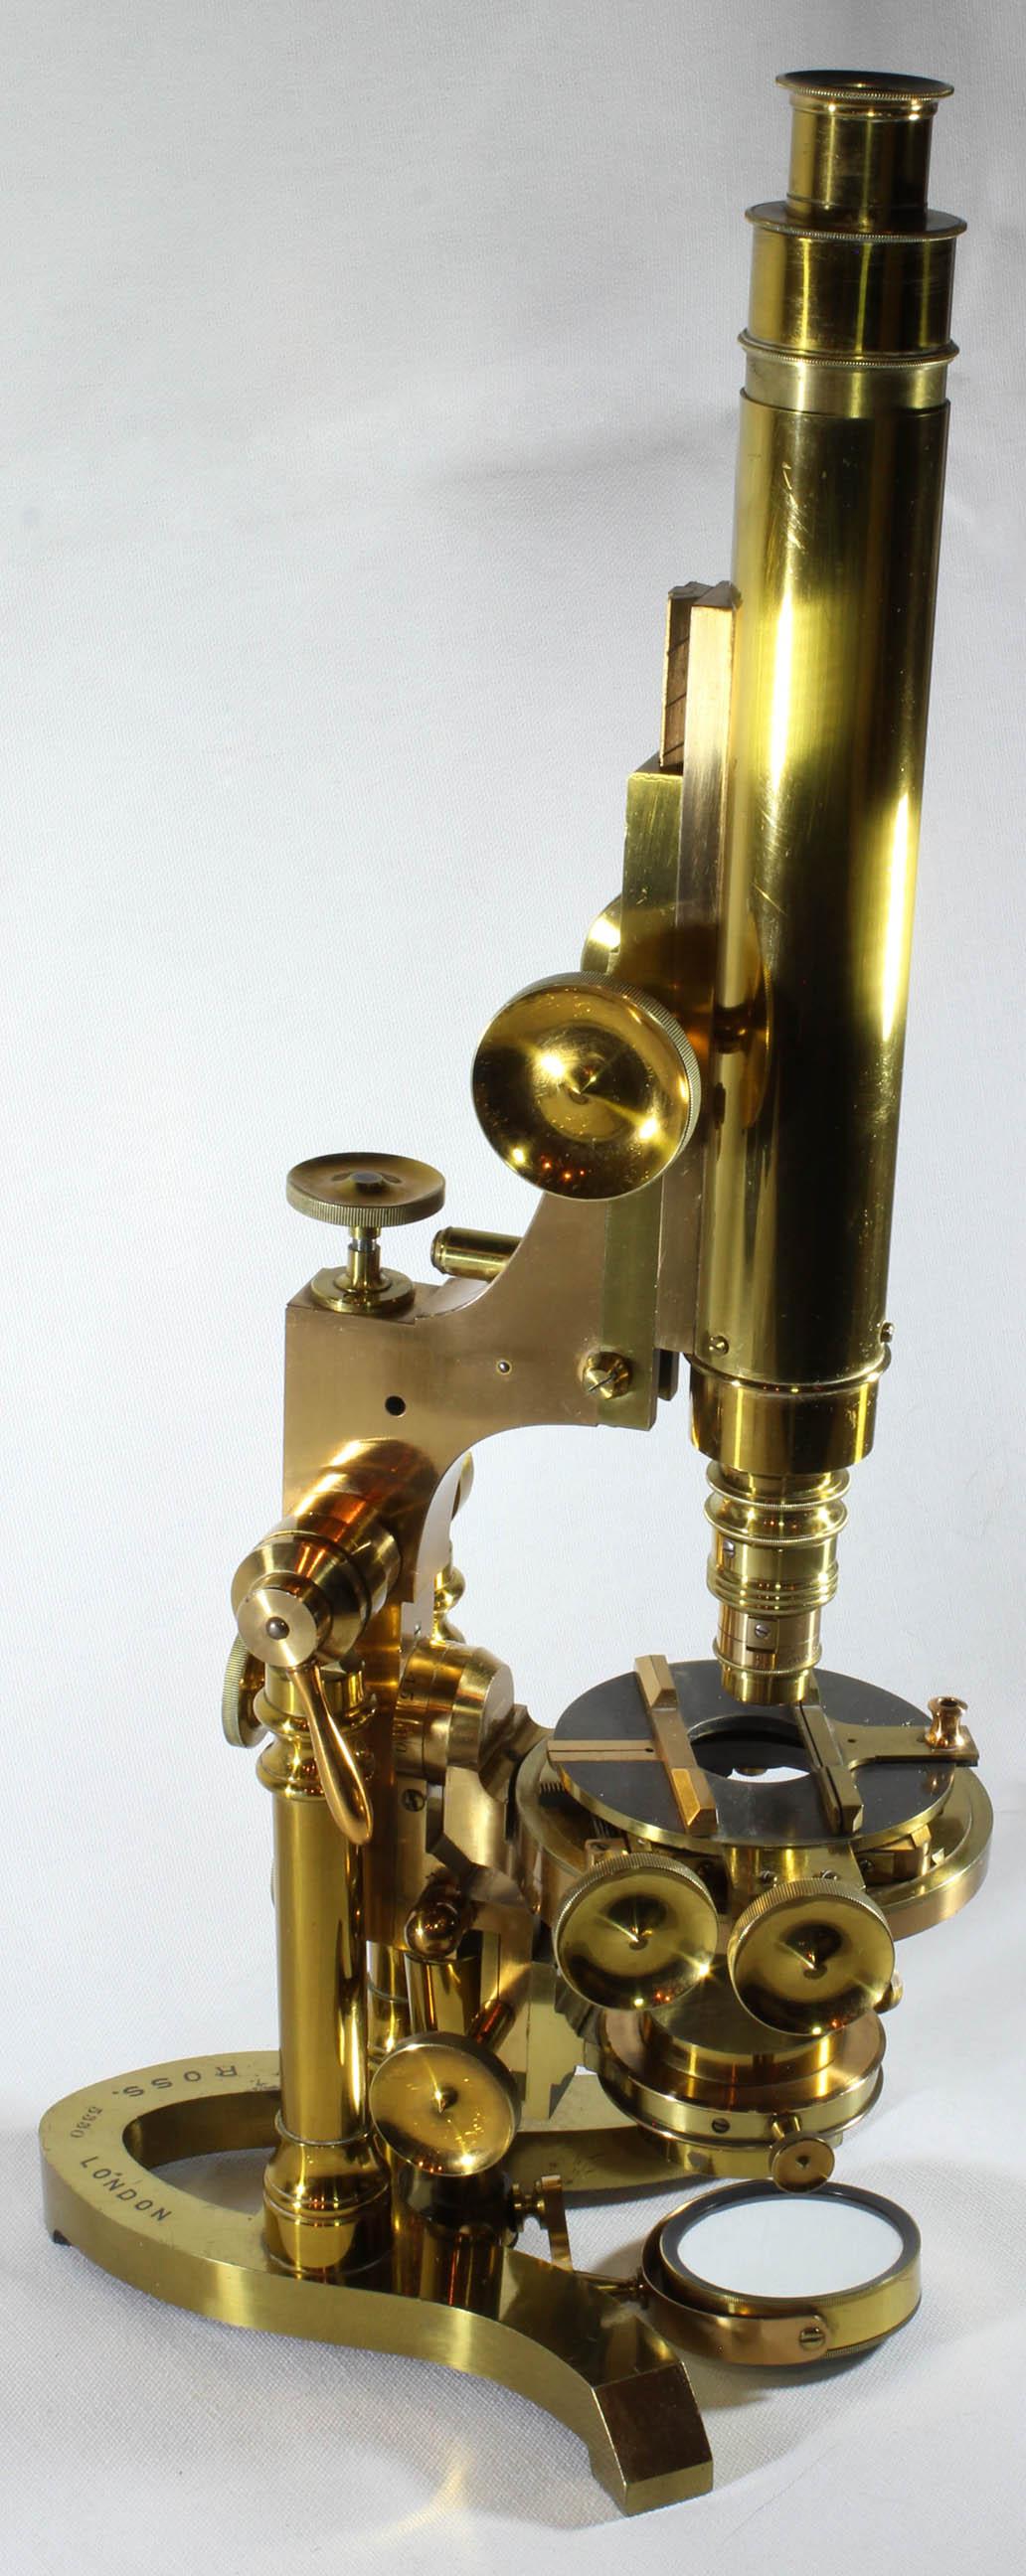 ROSS ZENTMAYER MONOCULAR MICROSCOPE